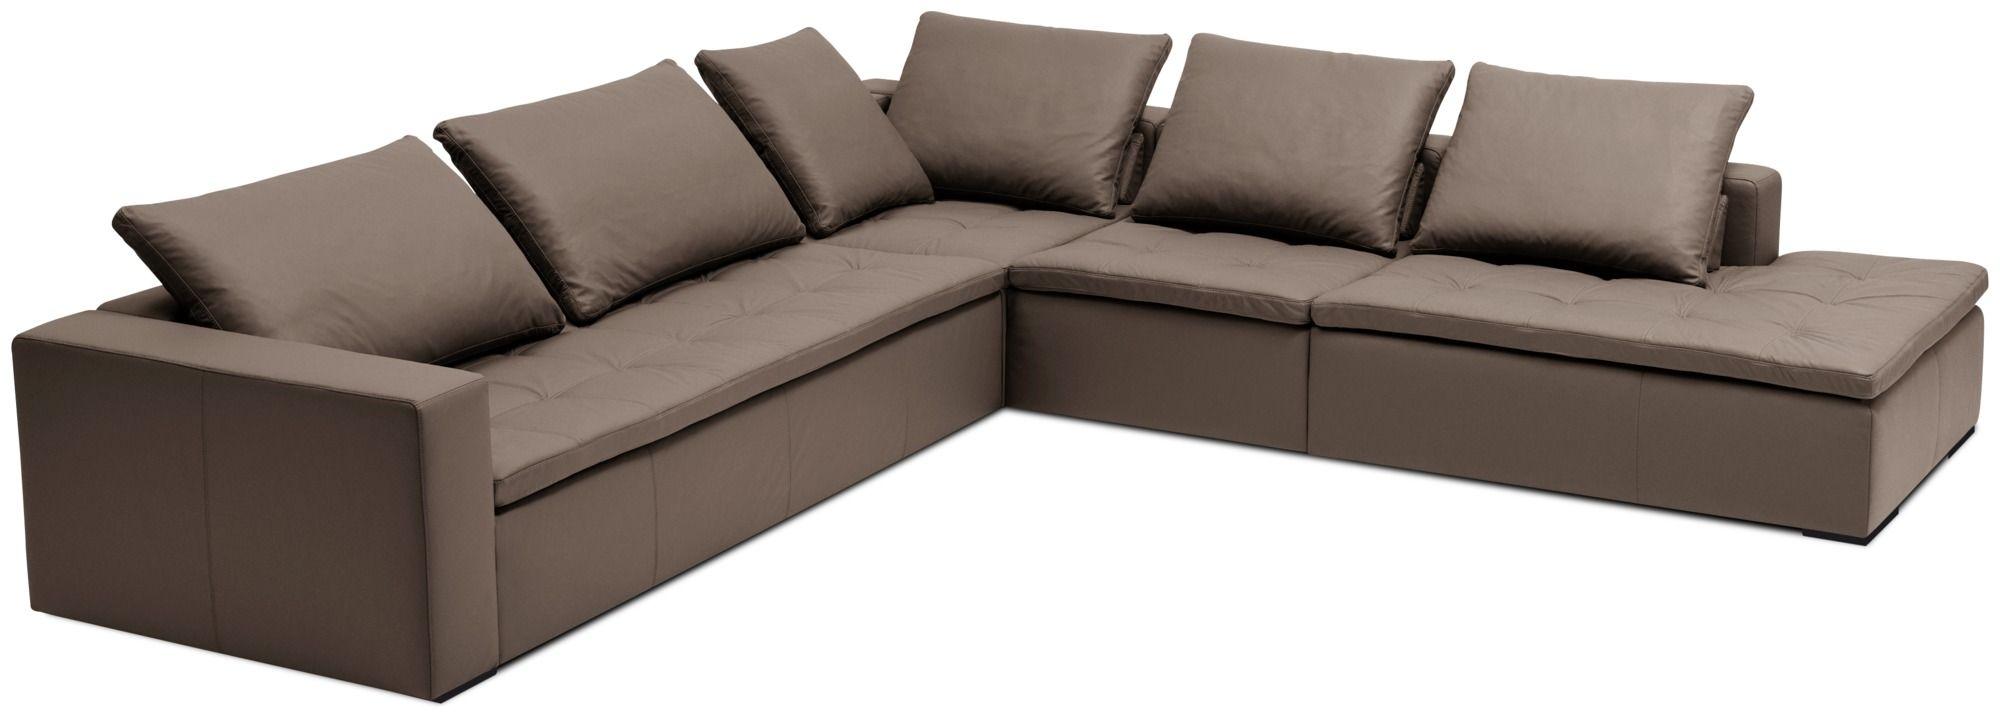 Pin By Boconcept Uae On Livingroom Contemporary Sofa Modern Sofa Contemporary Lounge